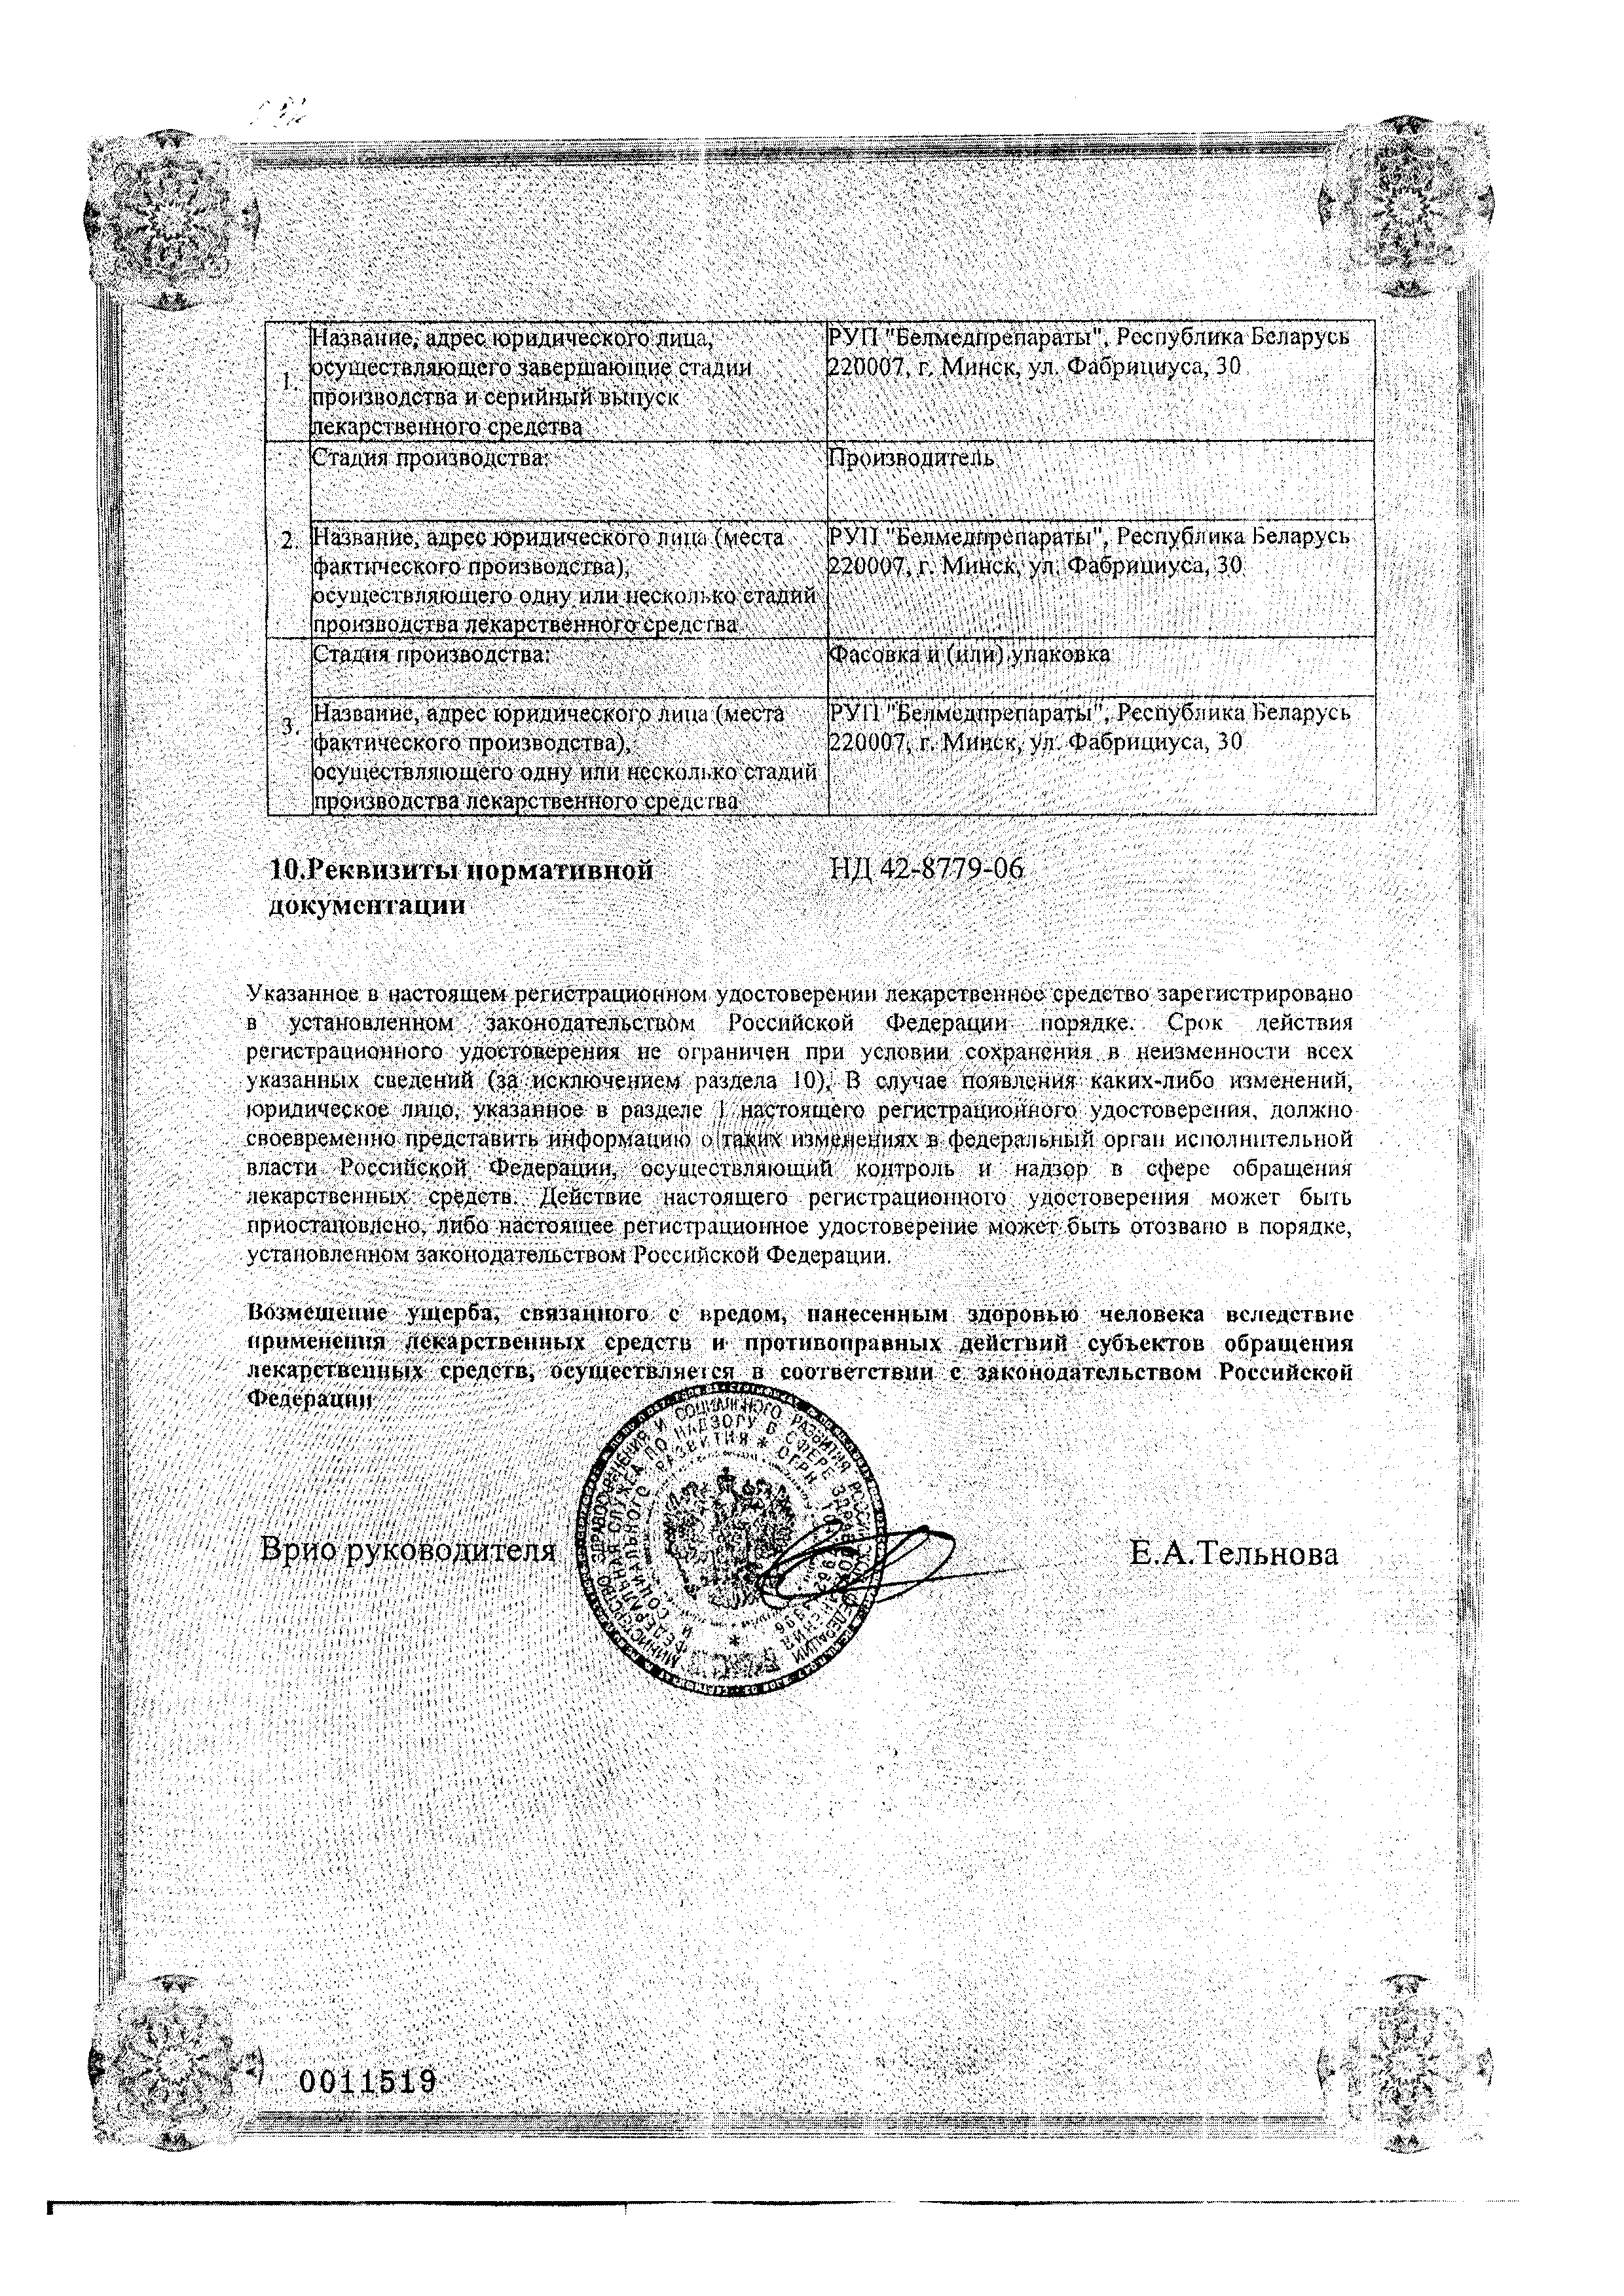 Доксициклин сертификат